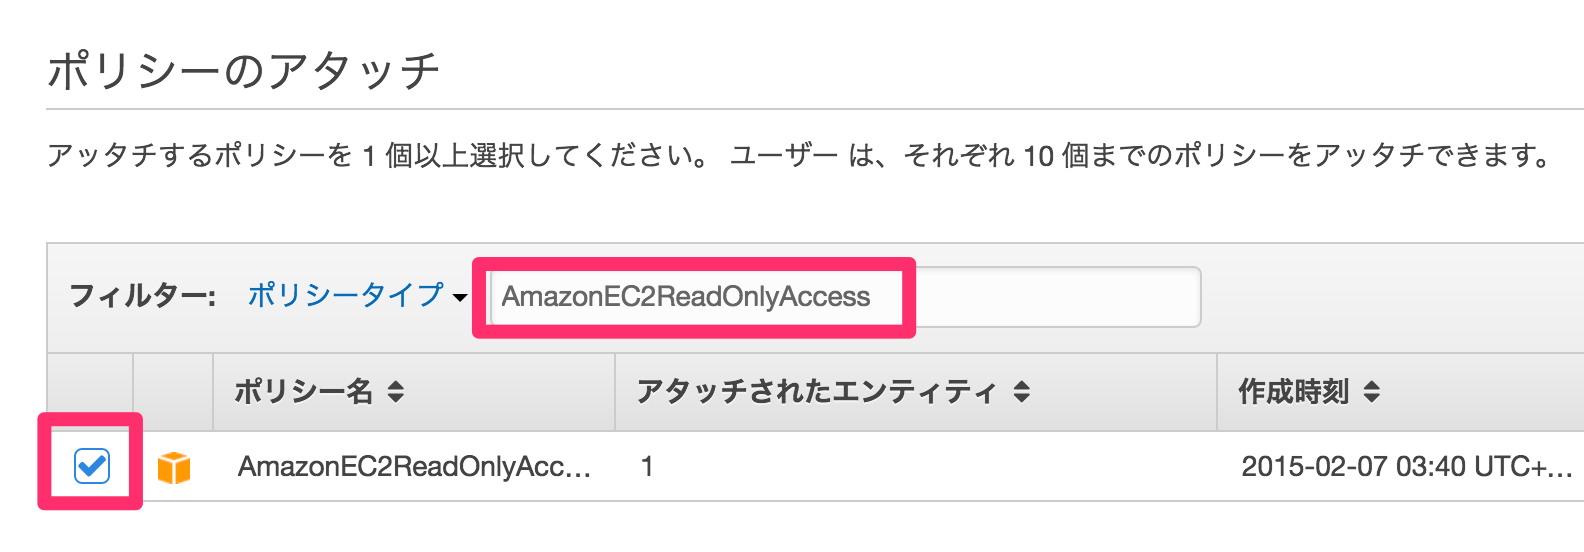 AmazonEC2ReadOnlyAccess